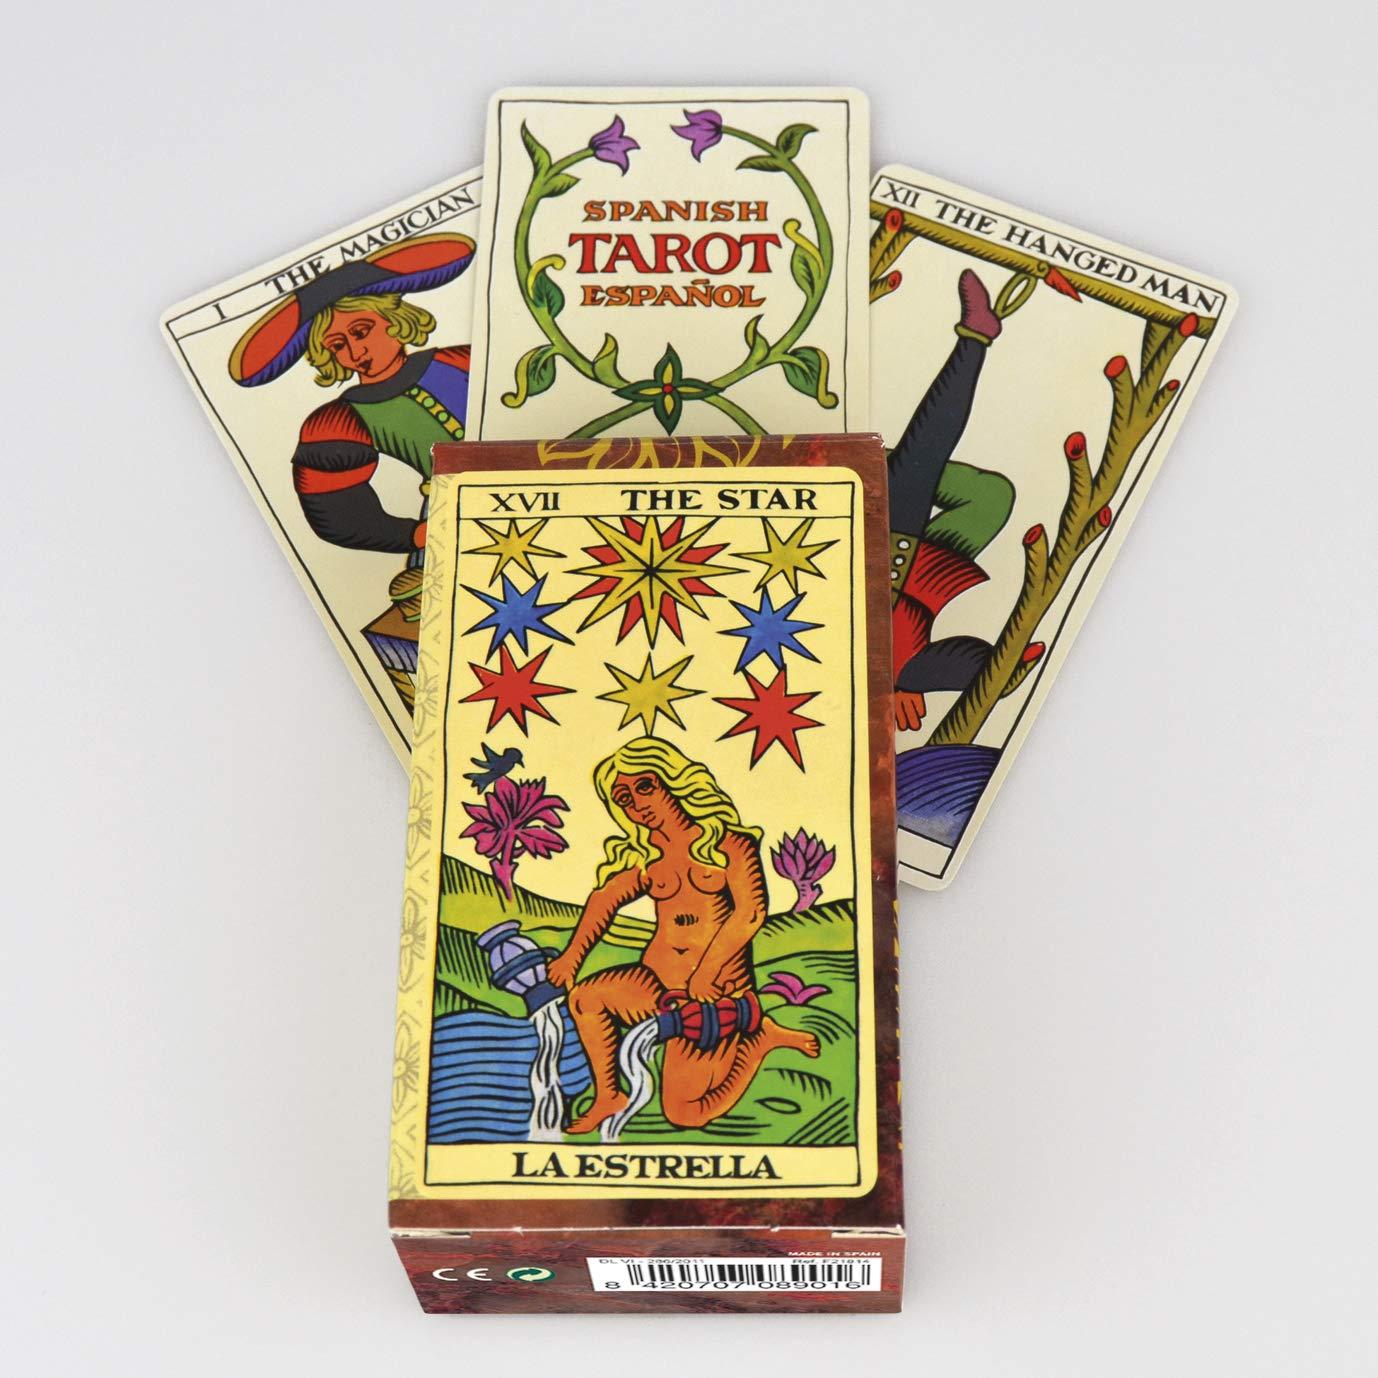 Spanish Tarot Espanol (Spanish Tarot Espanol Bilingual)